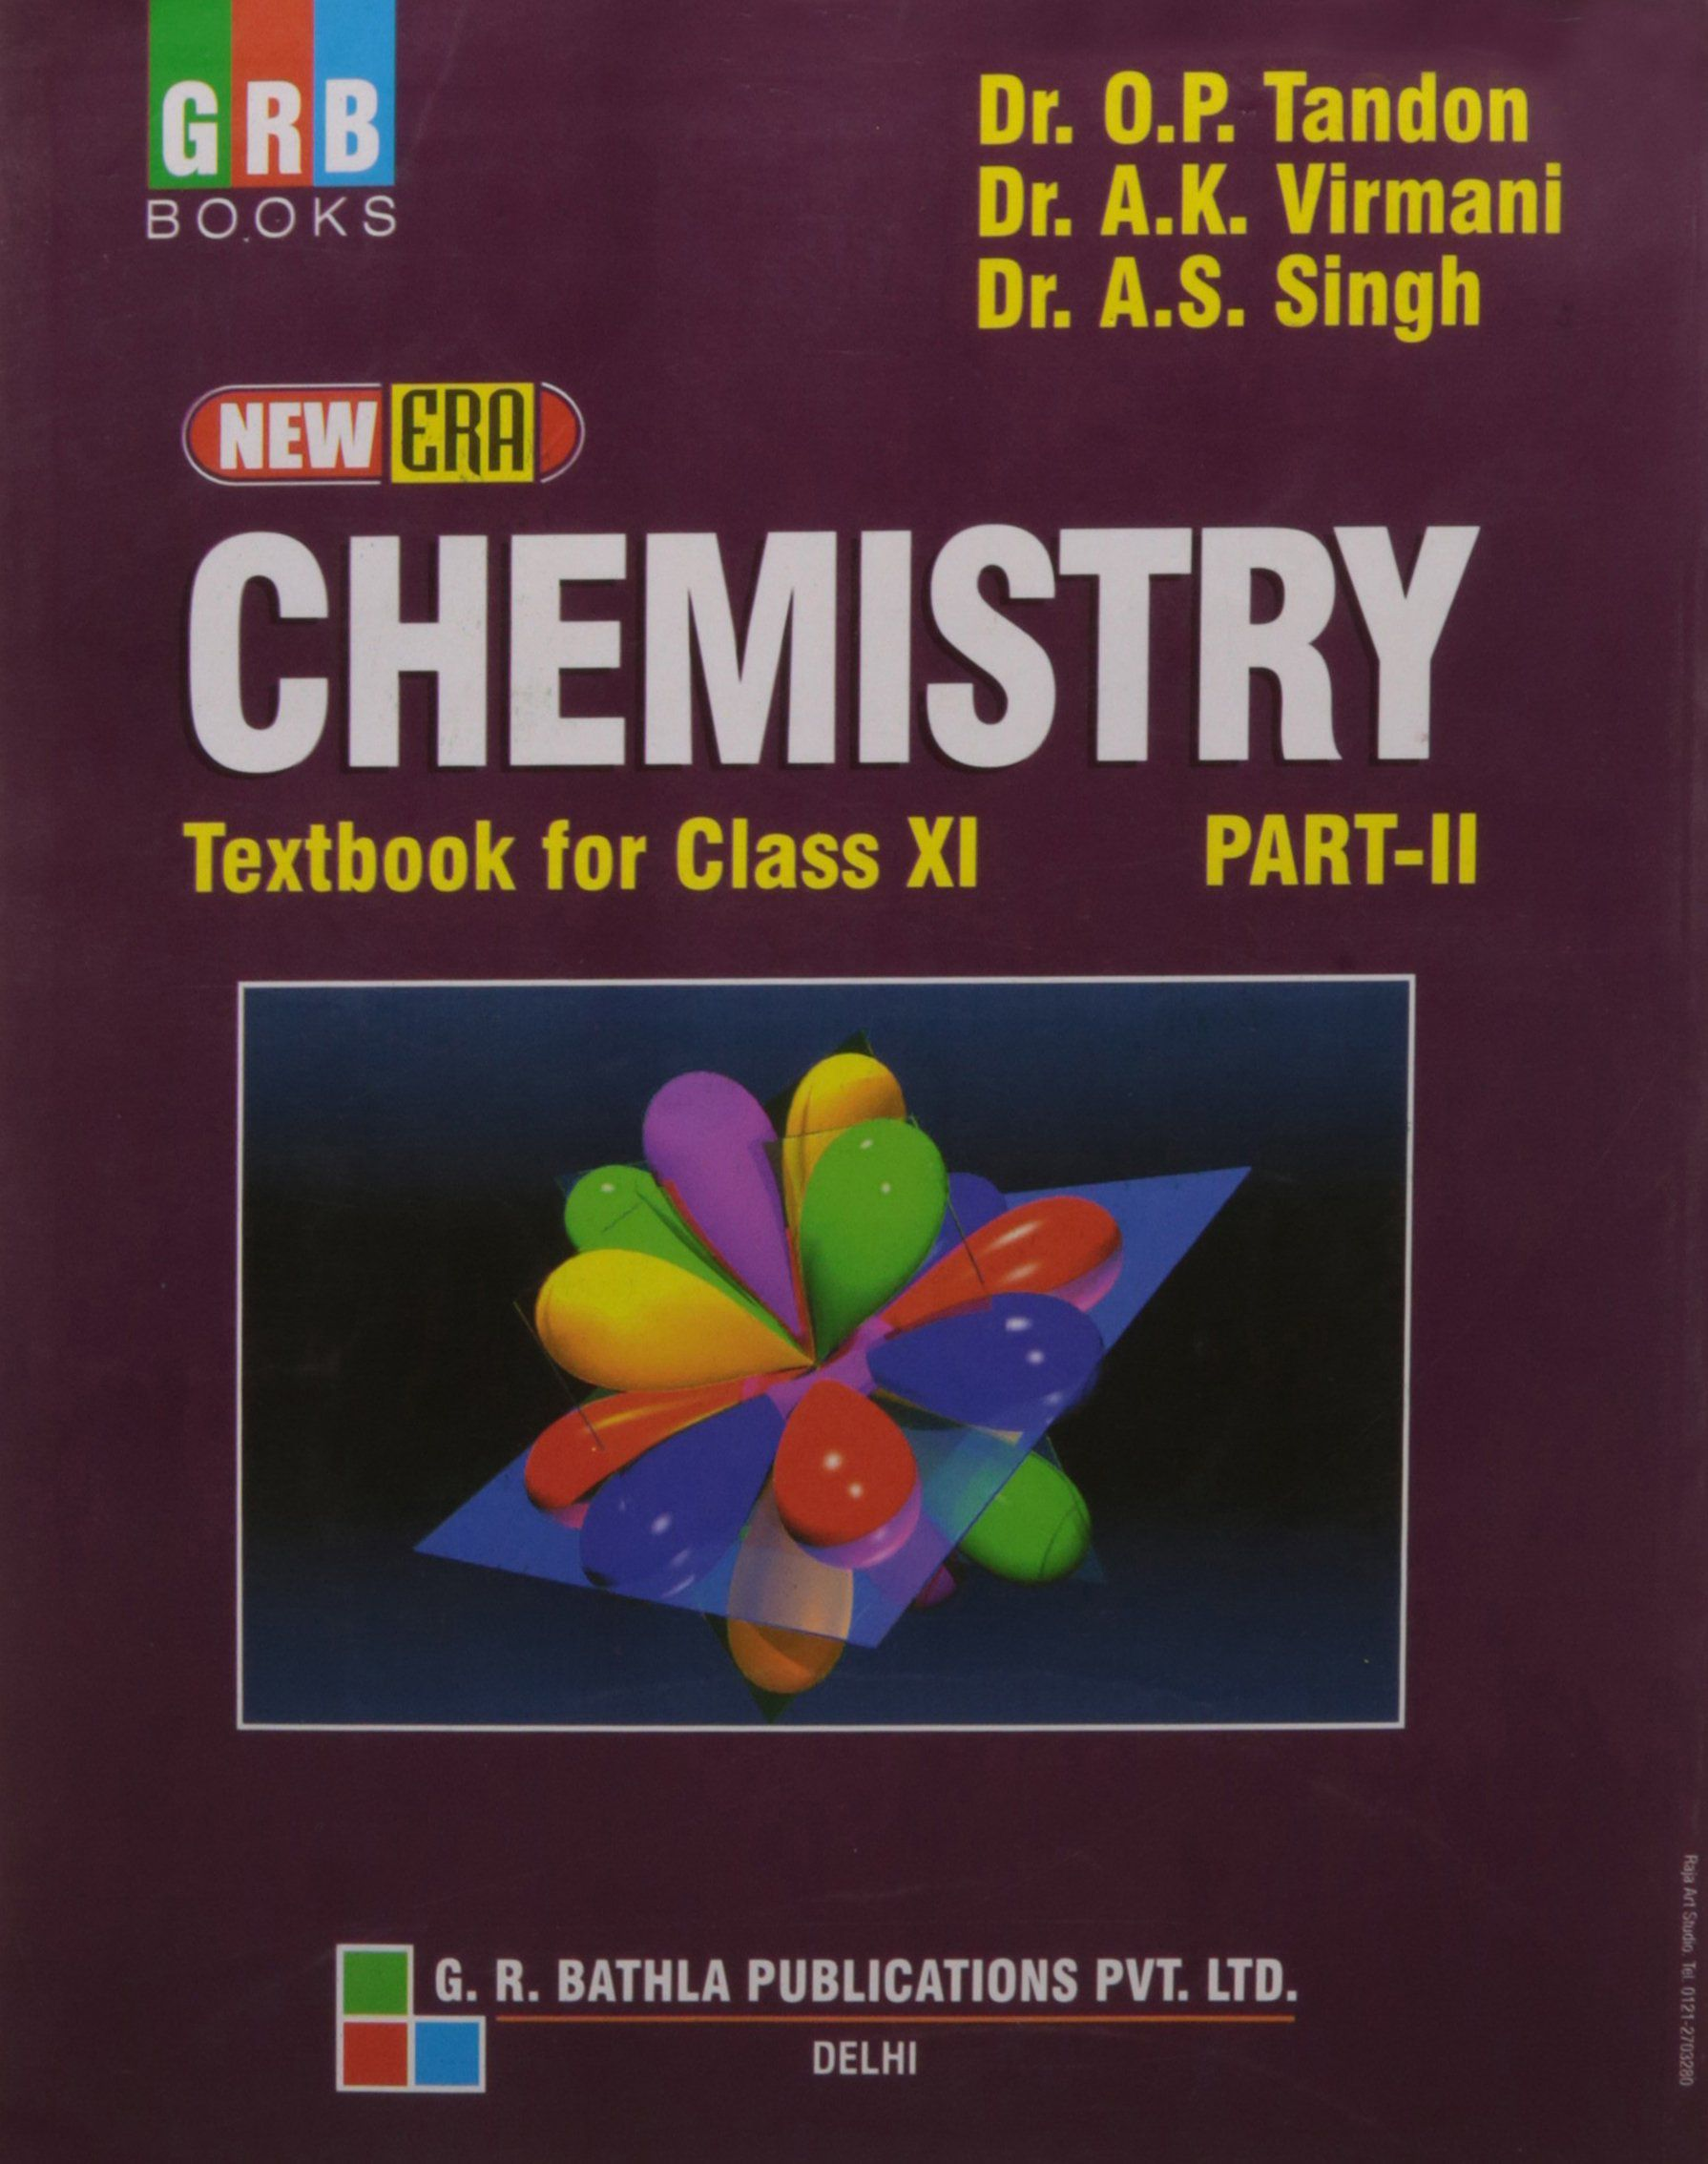 New Era Chemistry Textbook For Class 11 Part - II: Chemistry Class XI Part  - II